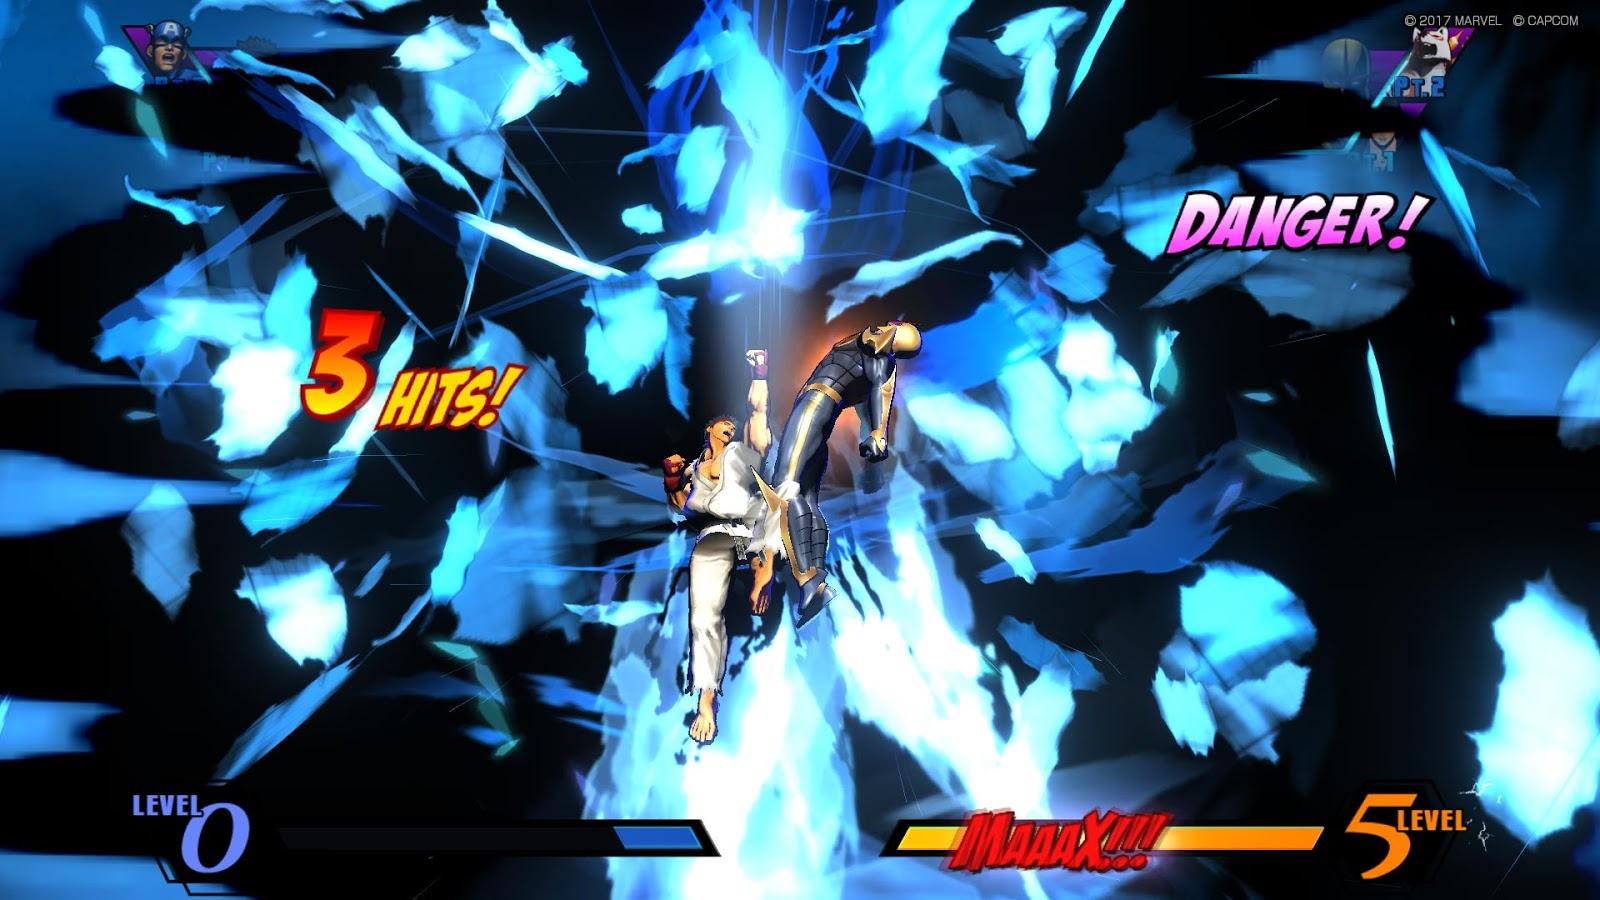 Ultimate Marvel vs Capcom 3 ESPAÑOL PC Descargar Full (CODEX) 1